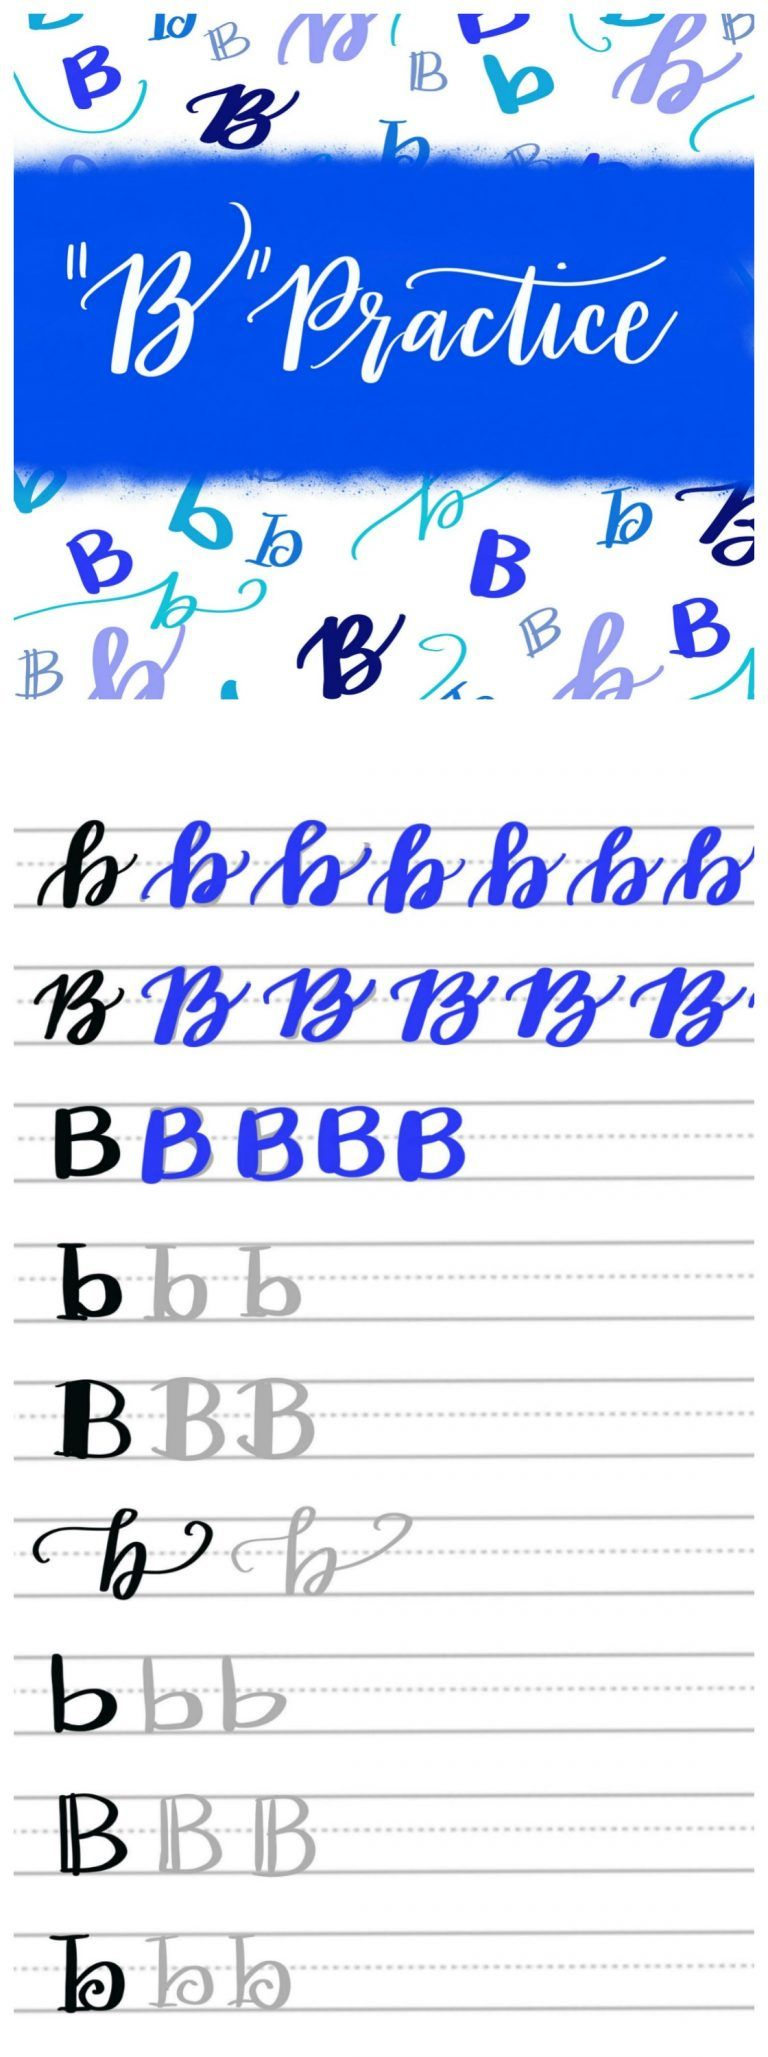 Free Practice Sheets 9 Different Ways To Hand Letter A B Lettering Practice Lettering Hand Lettering Practice [ 2057 x 768 Pixel ]